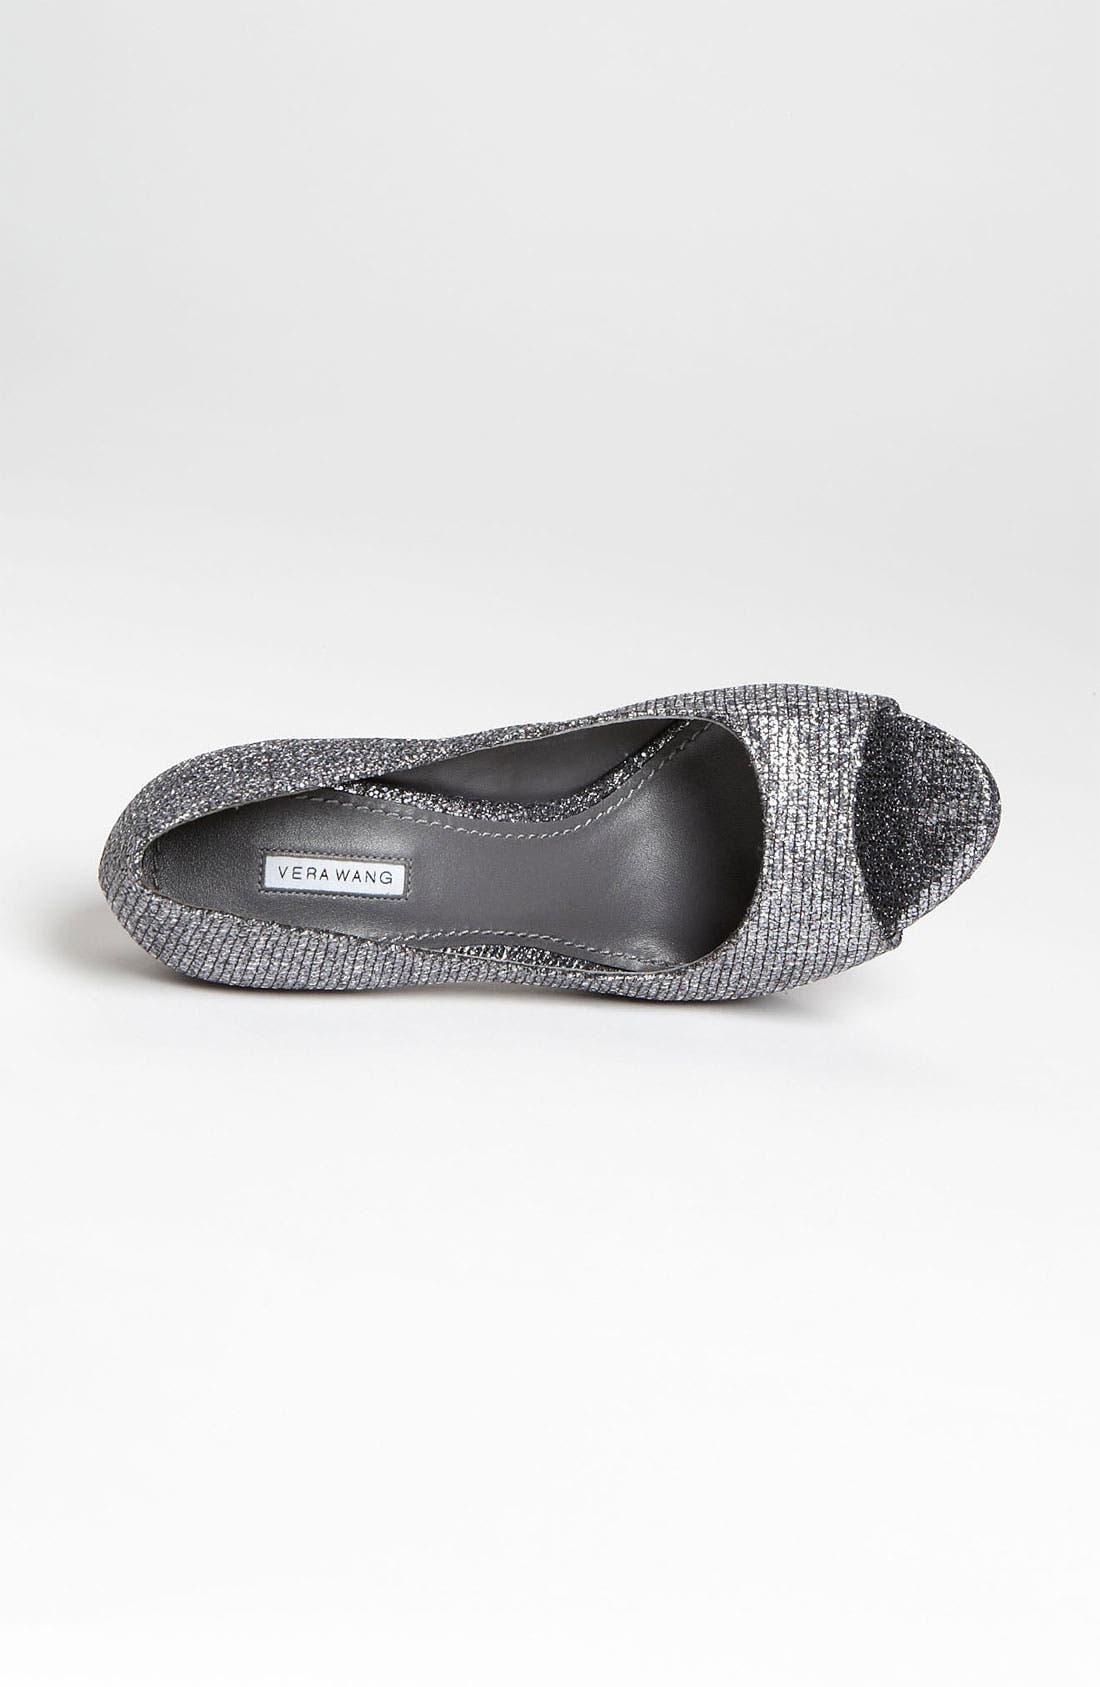 Footwear 'Selima' Peep Toe Pump,                             Alternate thumbnail 15, color,